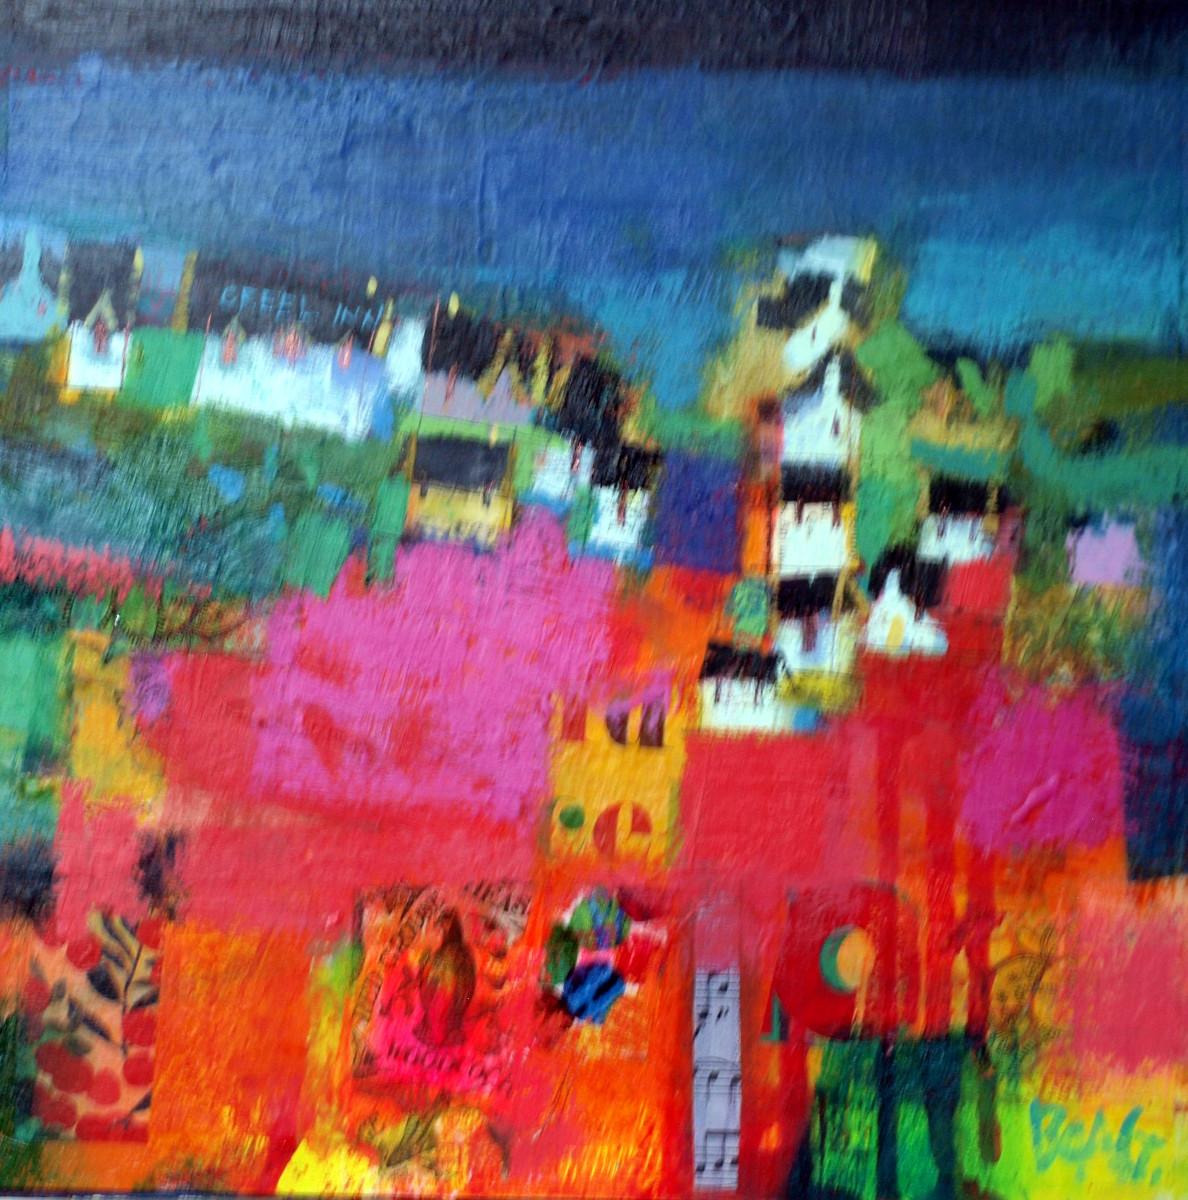 Creel Inn Catterline by francis boag